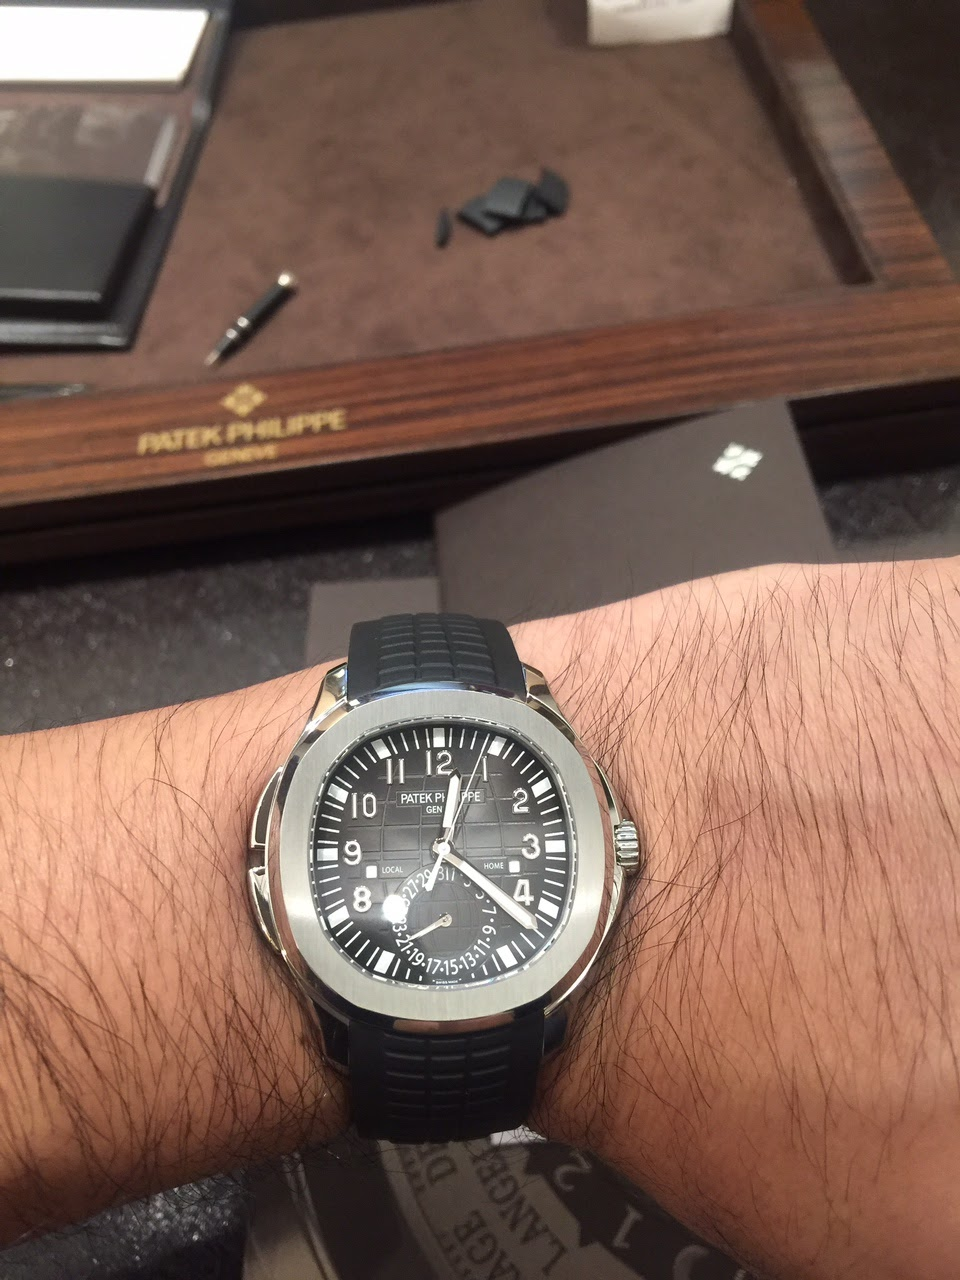 Patek Philippe Aquanaut 5164 Travel Time Wrist Shots